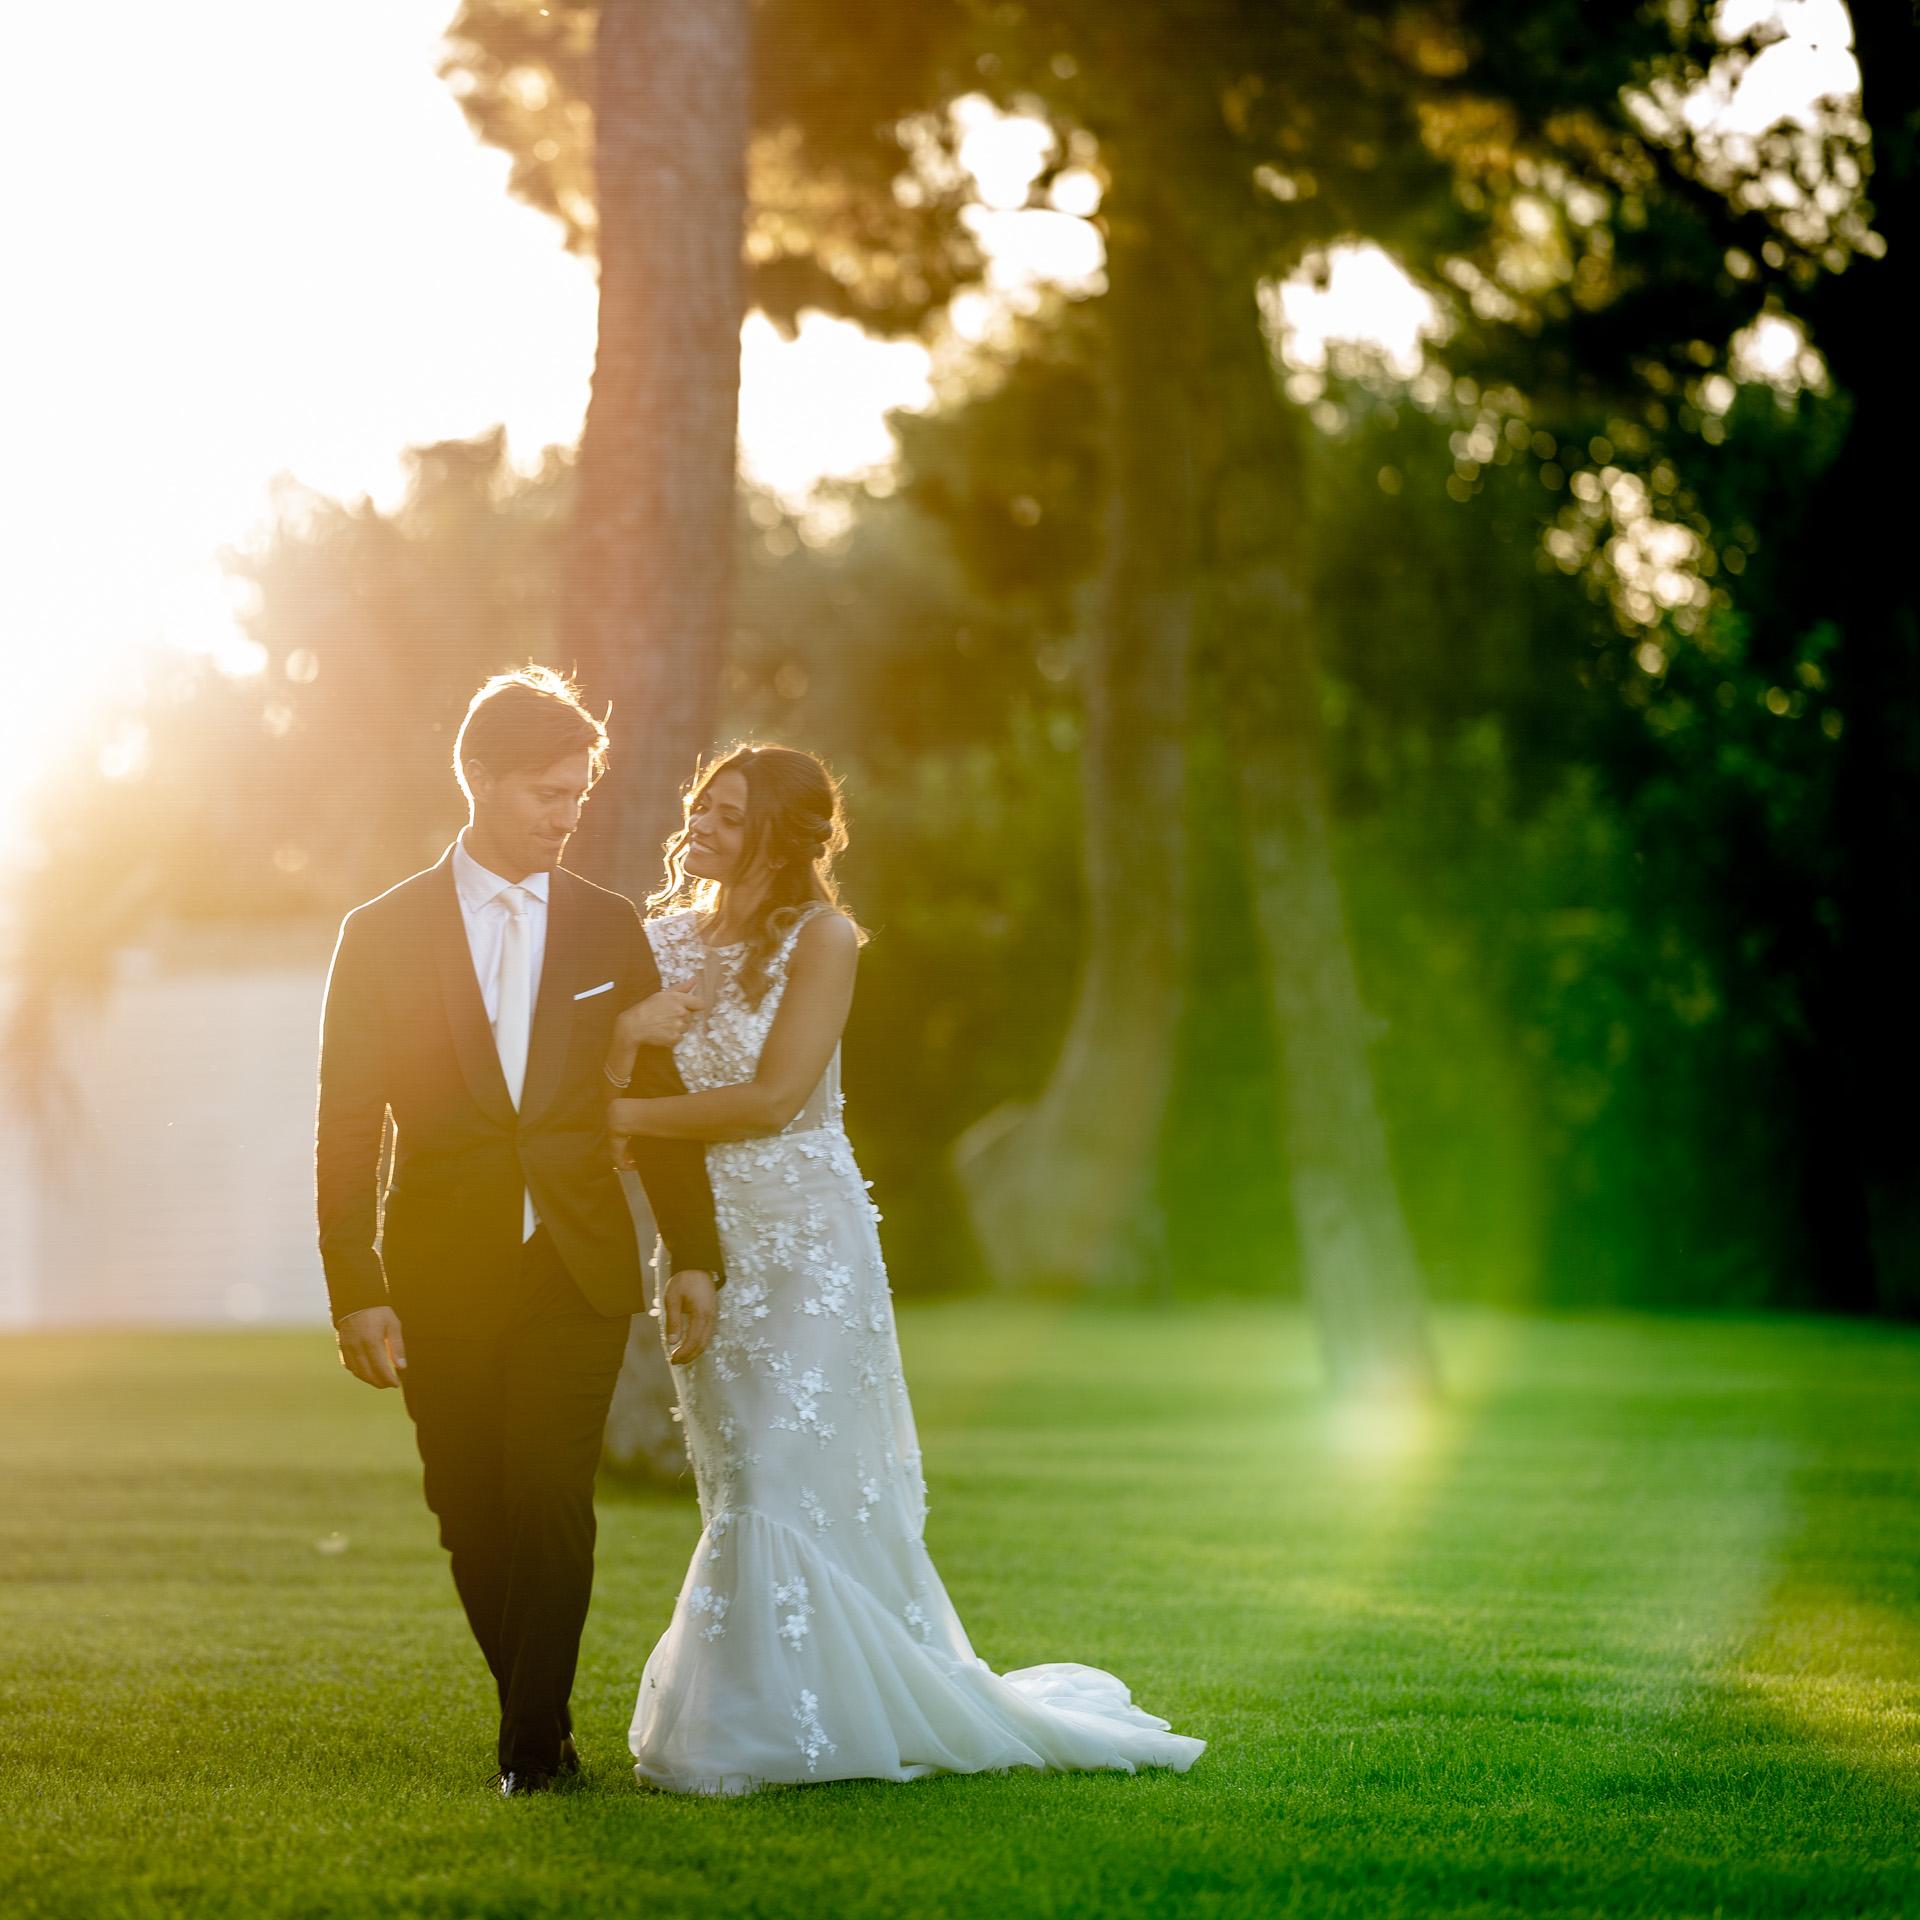 merafina photographer alfonso merafina nunzia e luca wedding